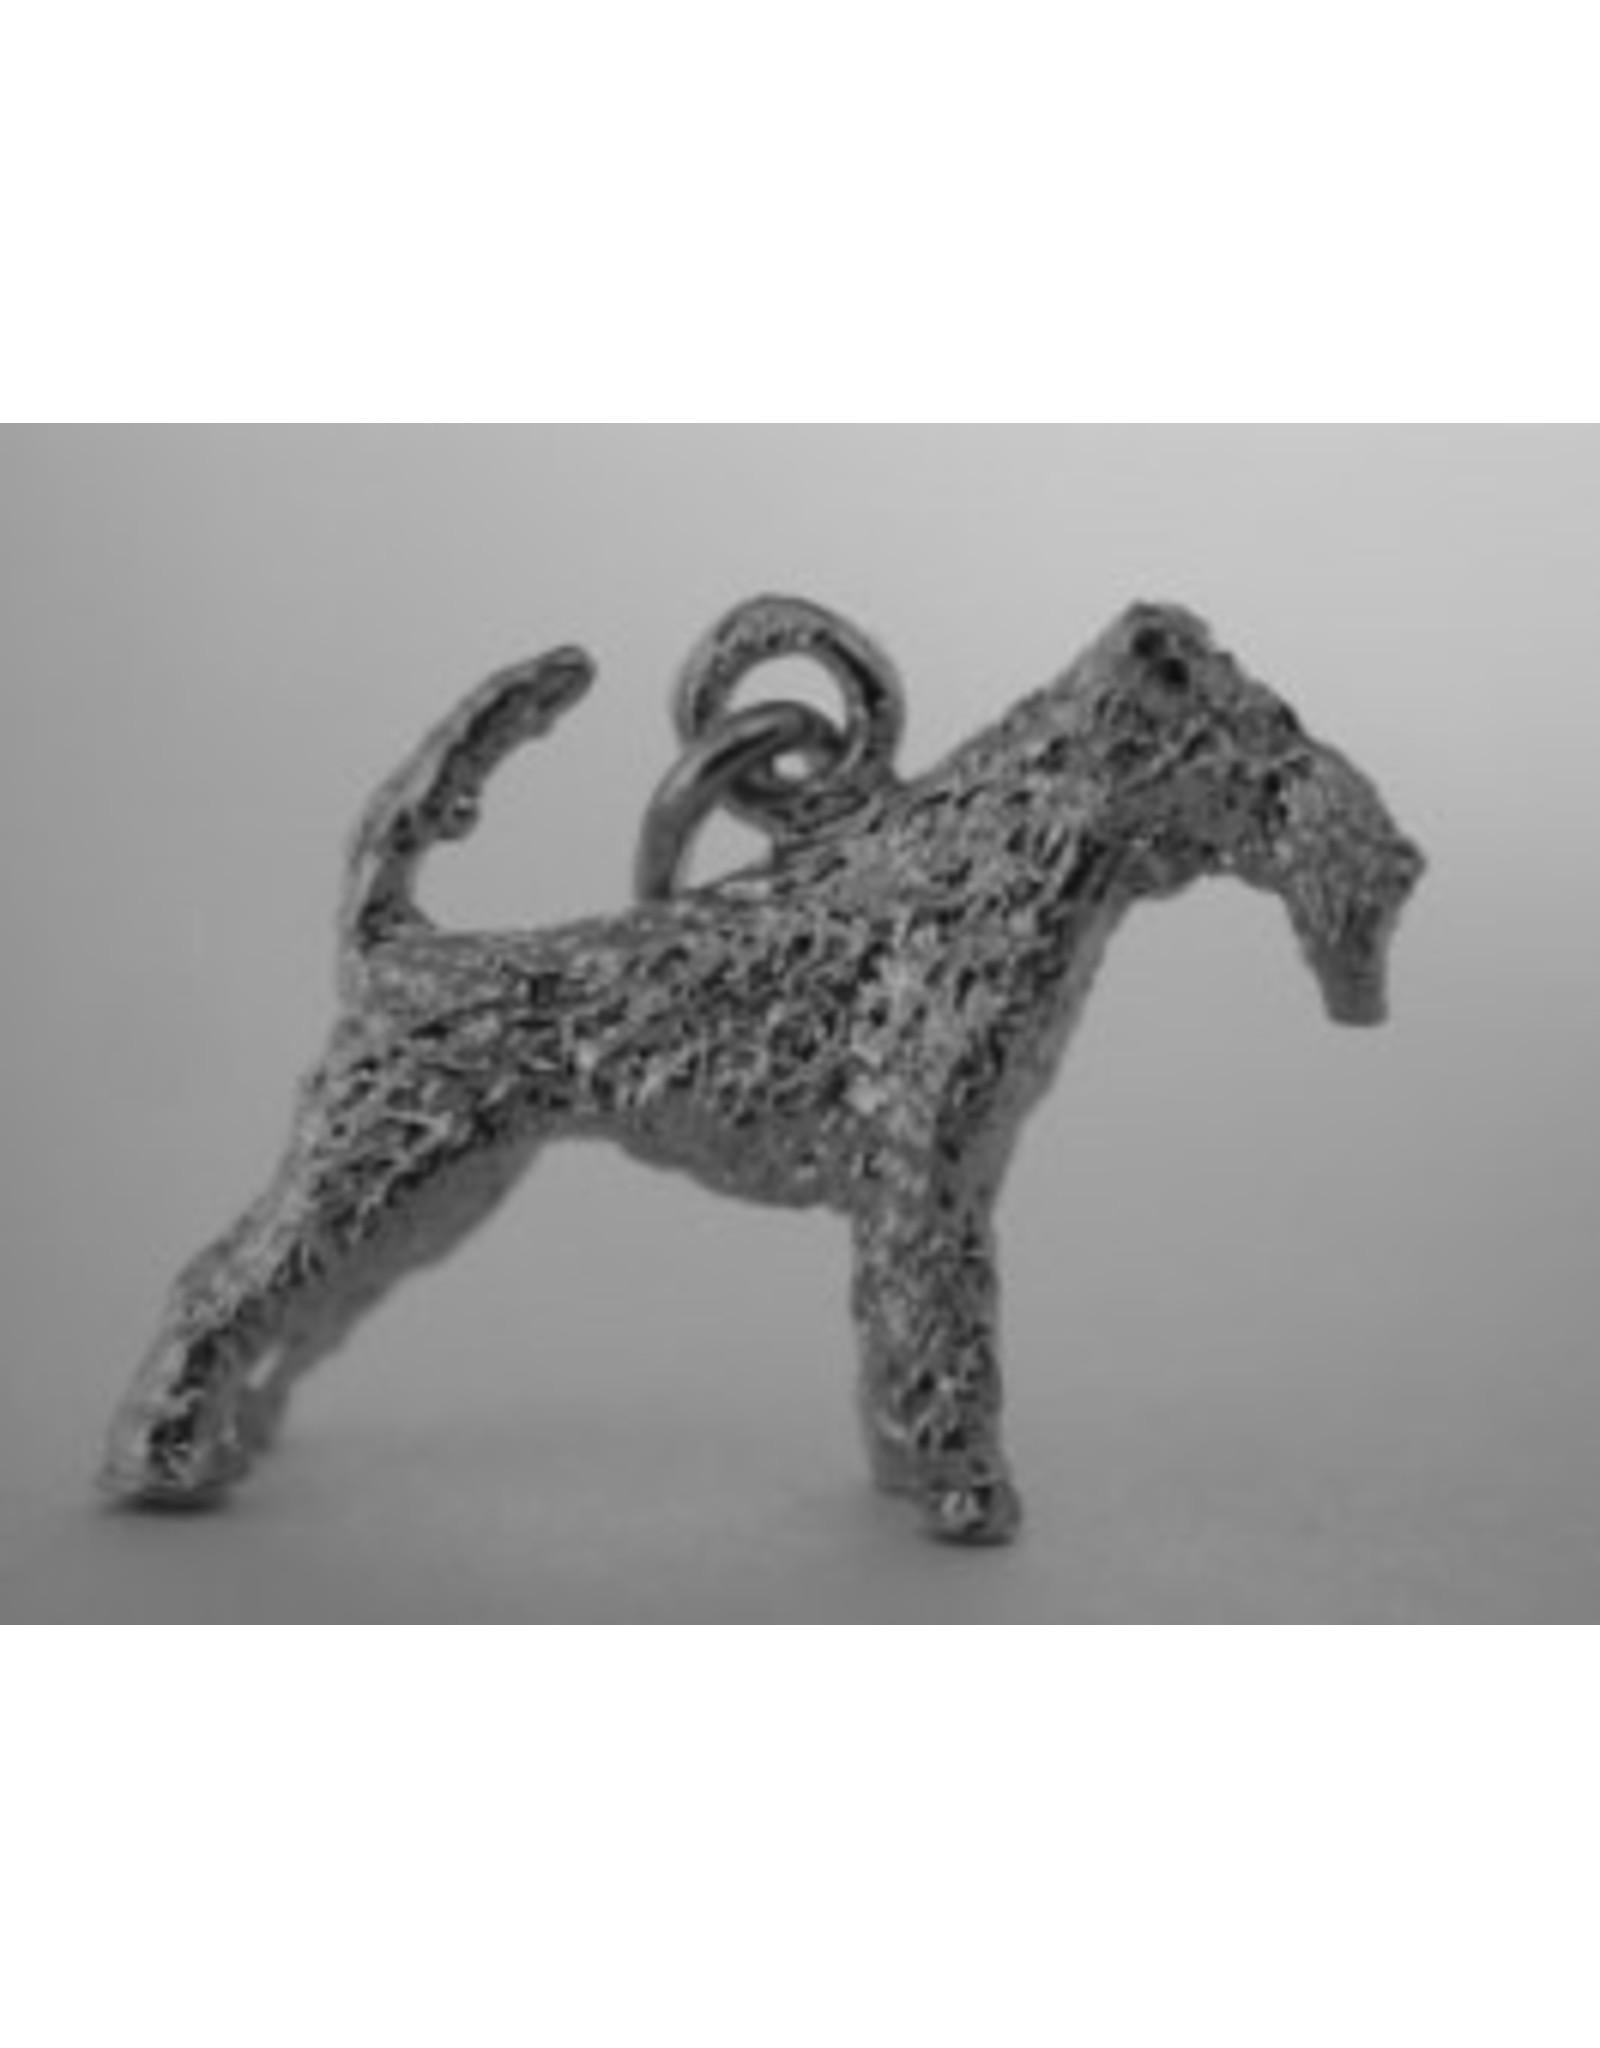 Handmade by Hanneke Weigel Zilveren Fox terrier draadhaar